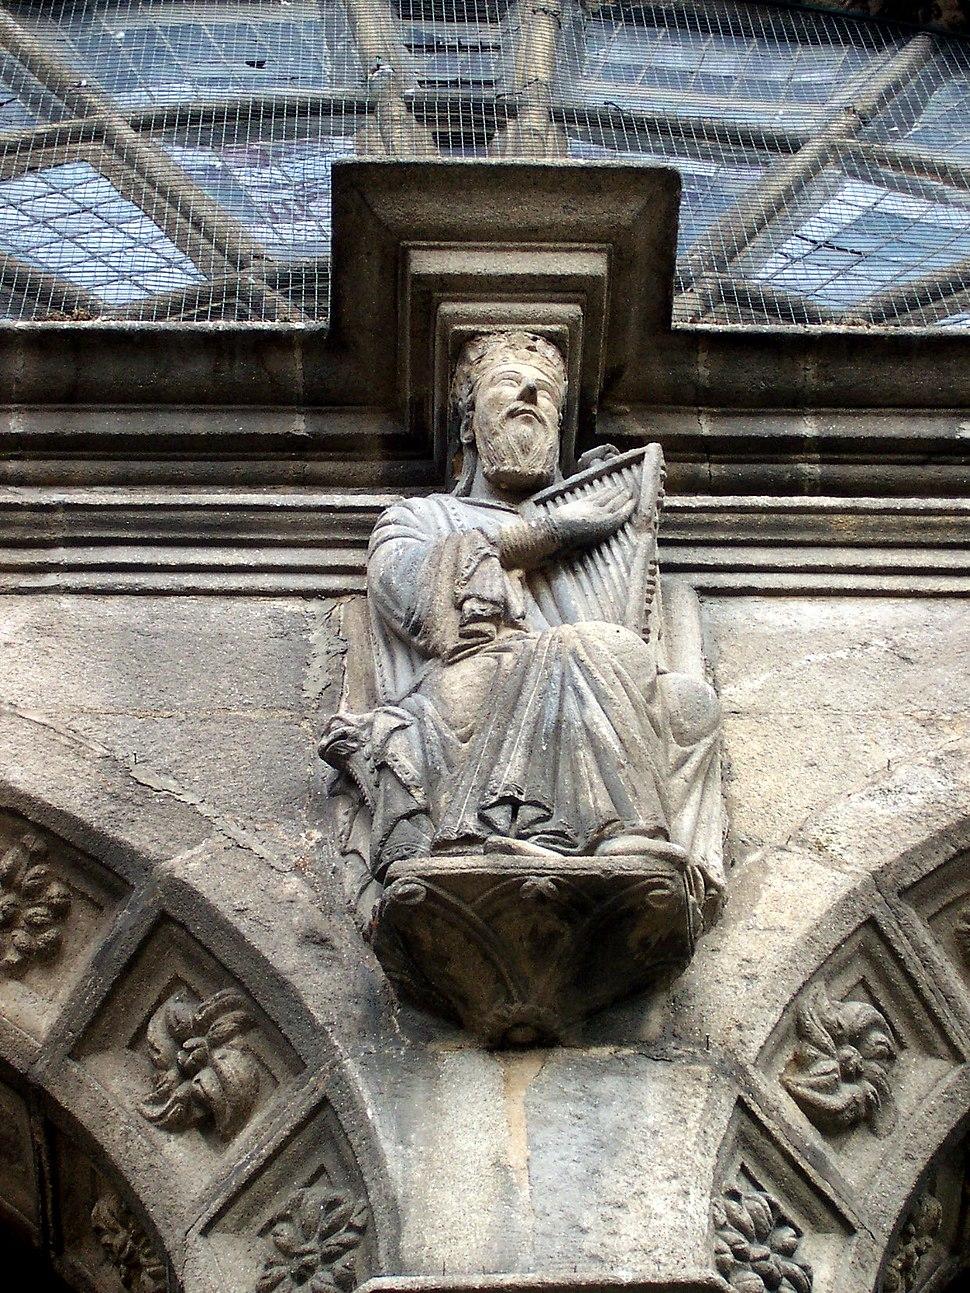 Escultura de arpista na Catedral de Ourense